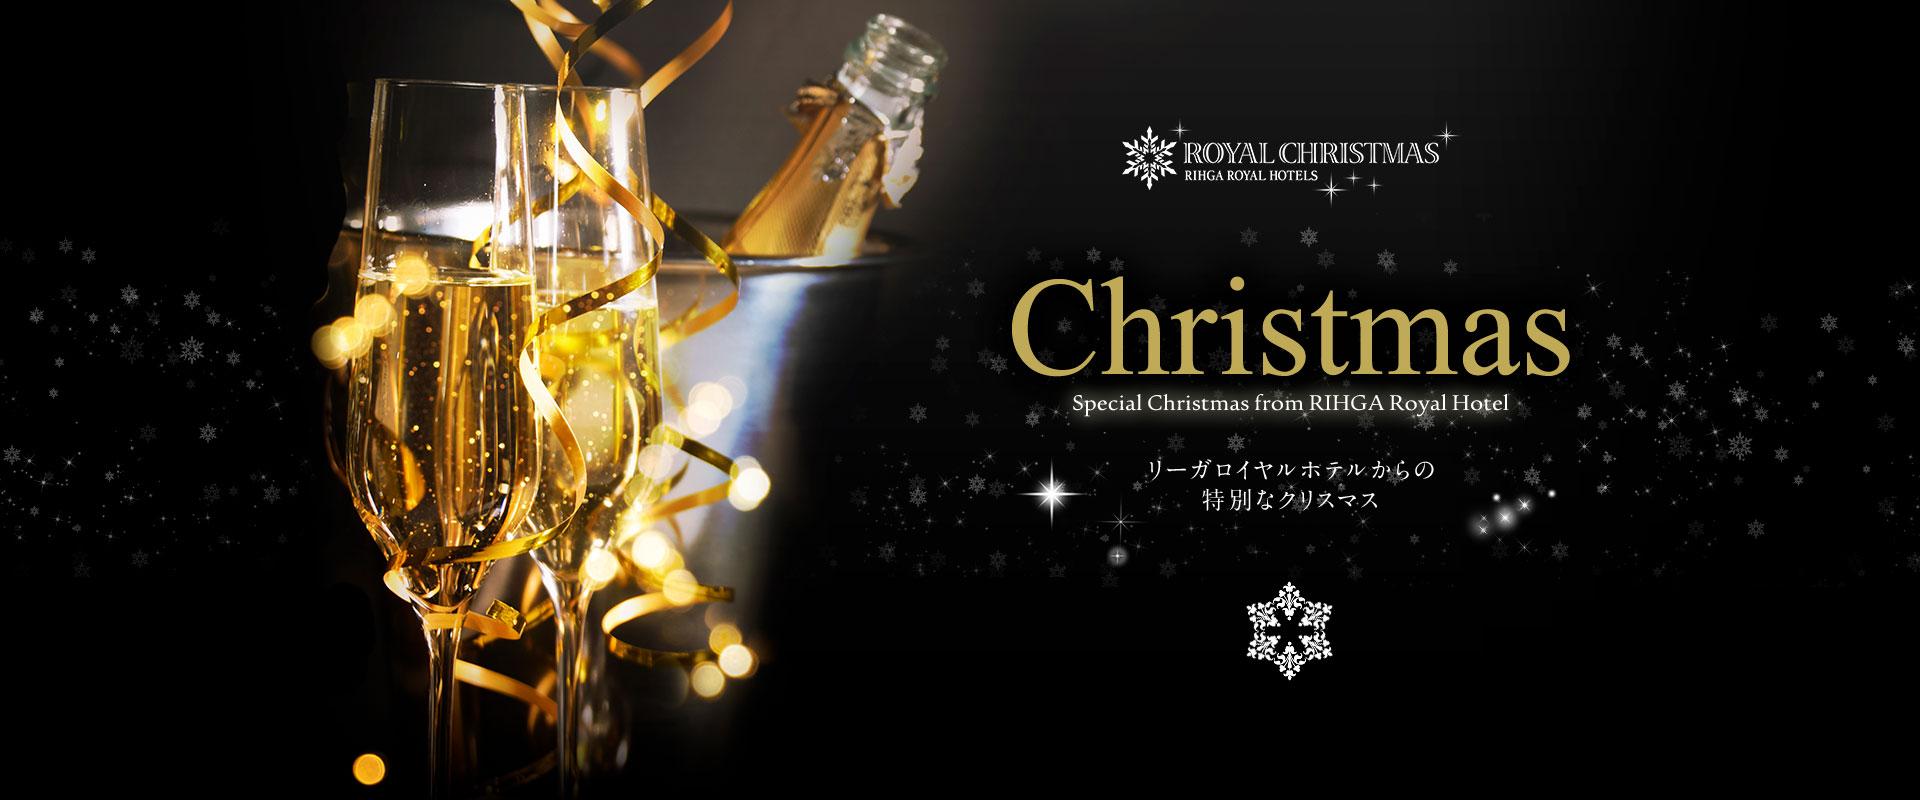 ROYAL CHIRISTMAS リーガロイヤルホテルからの特別なクリスマス